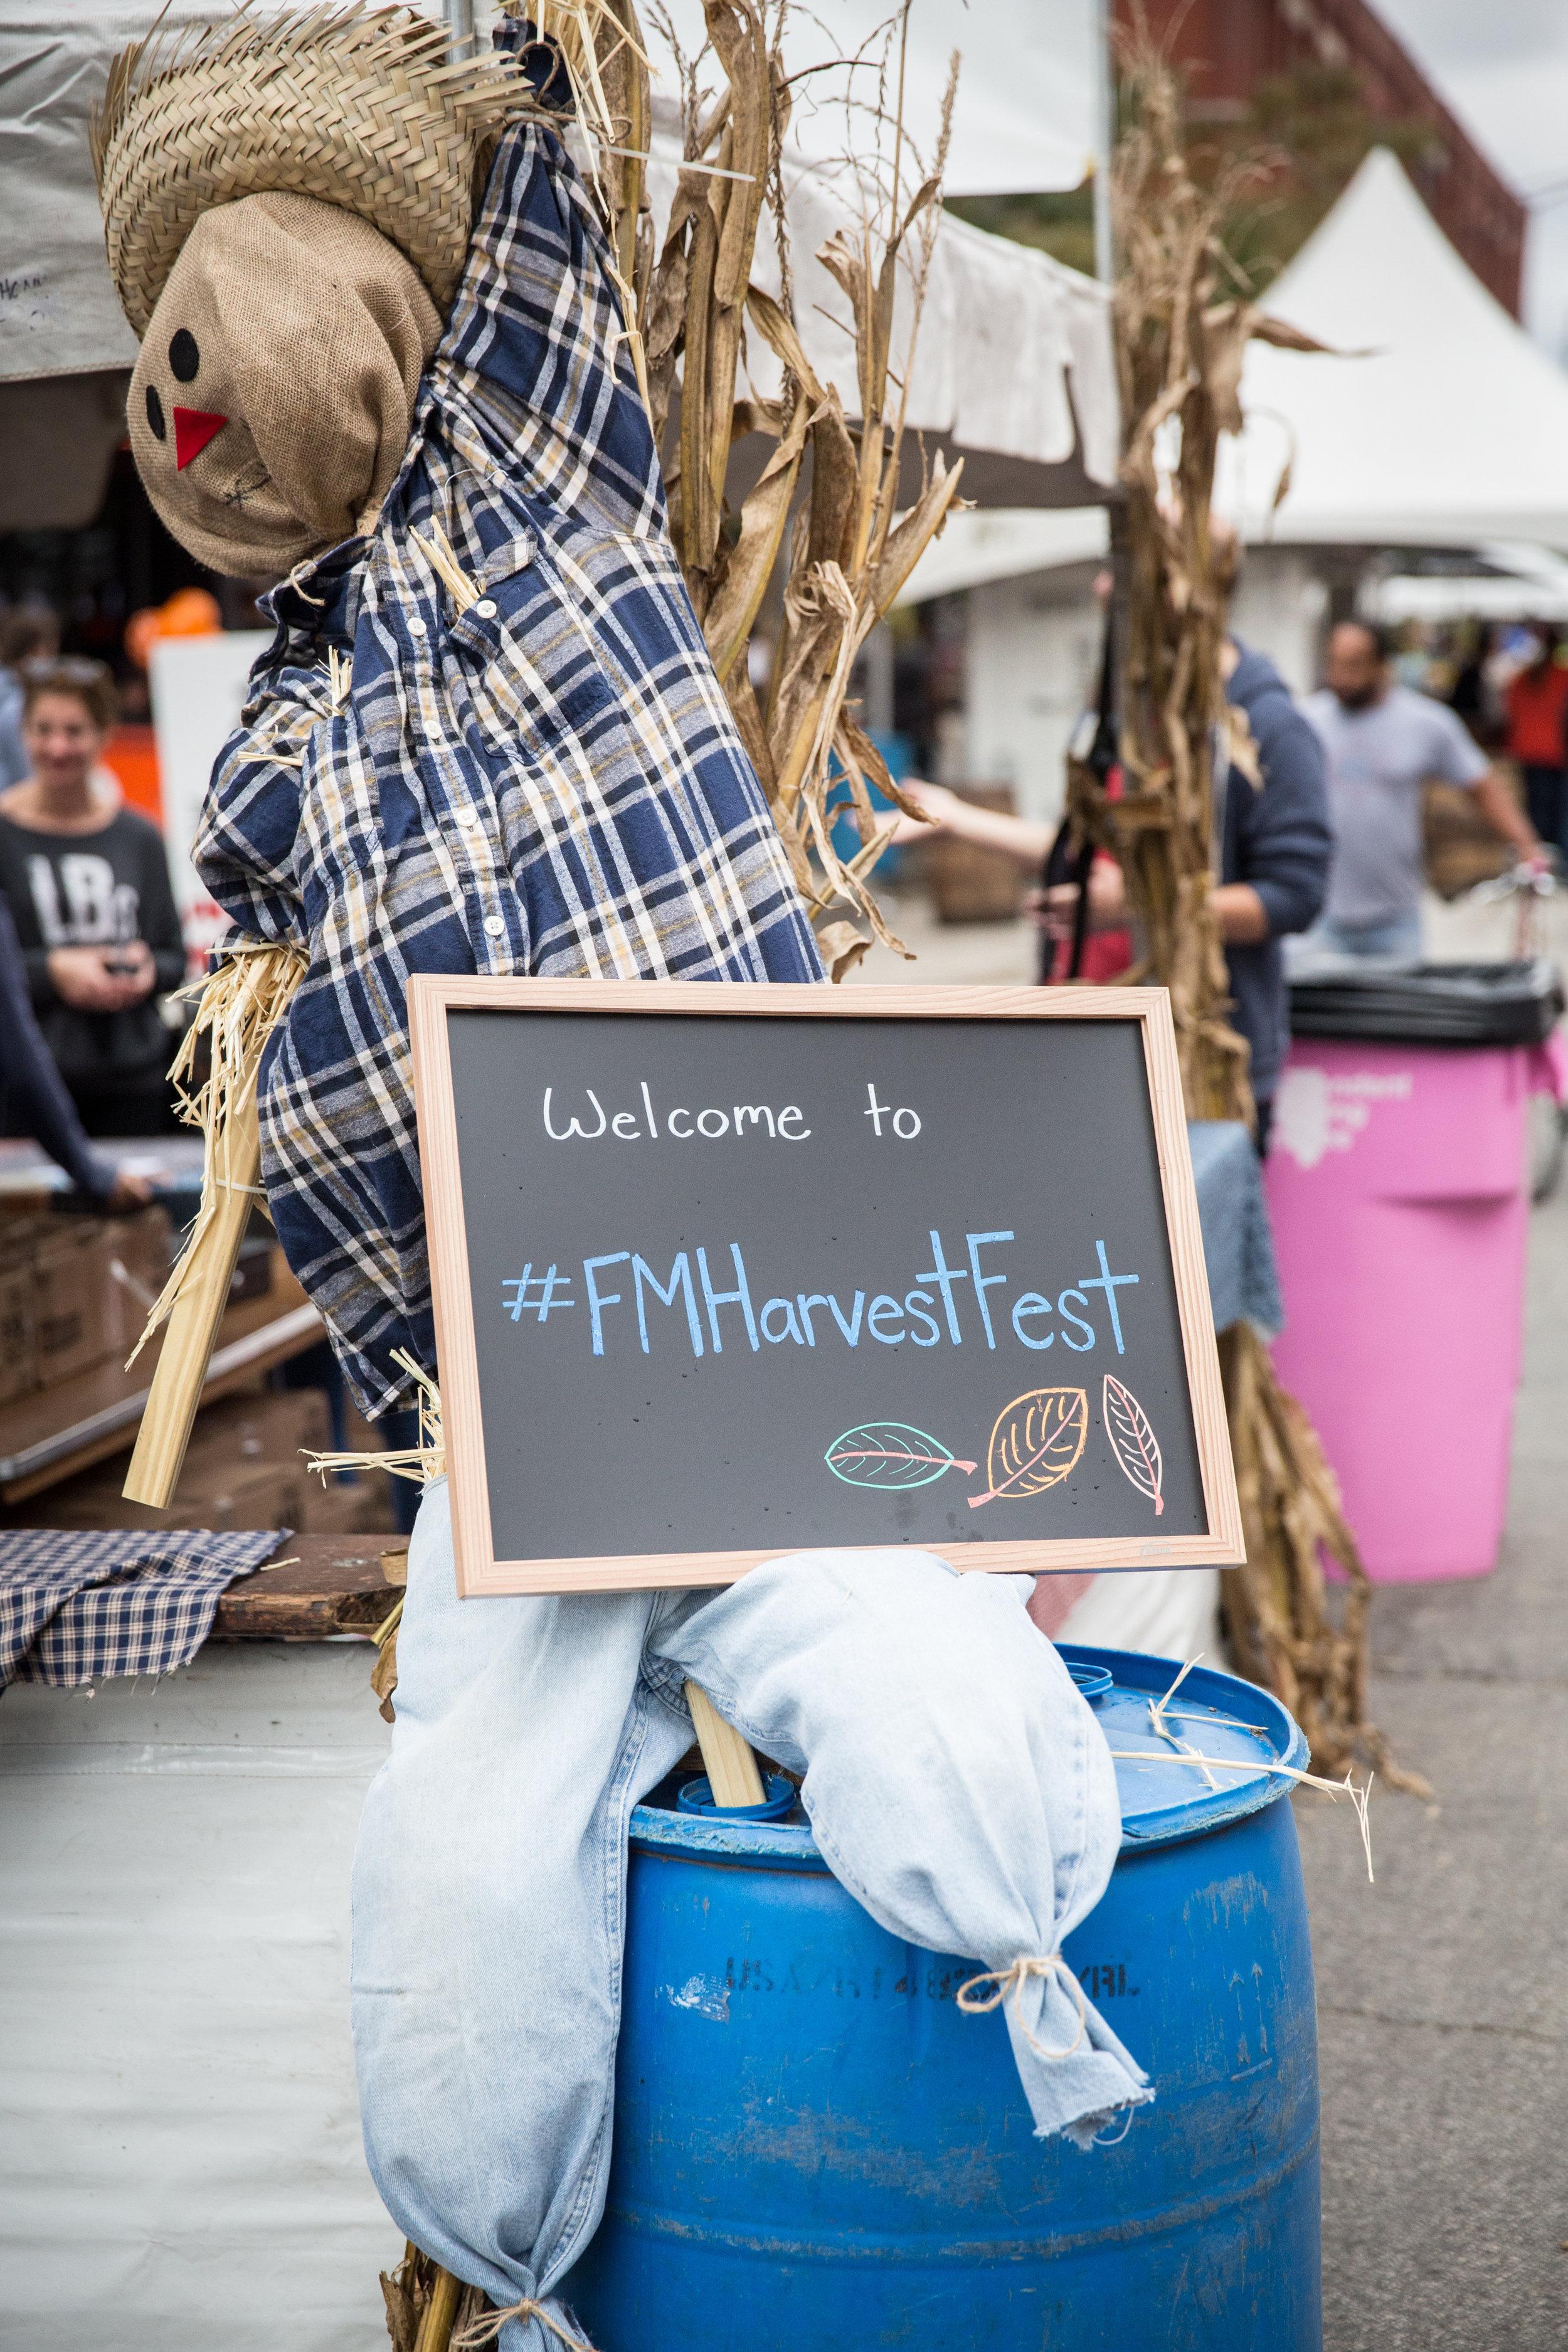 FM Harvest Fest 02OCT2016 GALDONES PHOTOGRAPHY-1.jpg